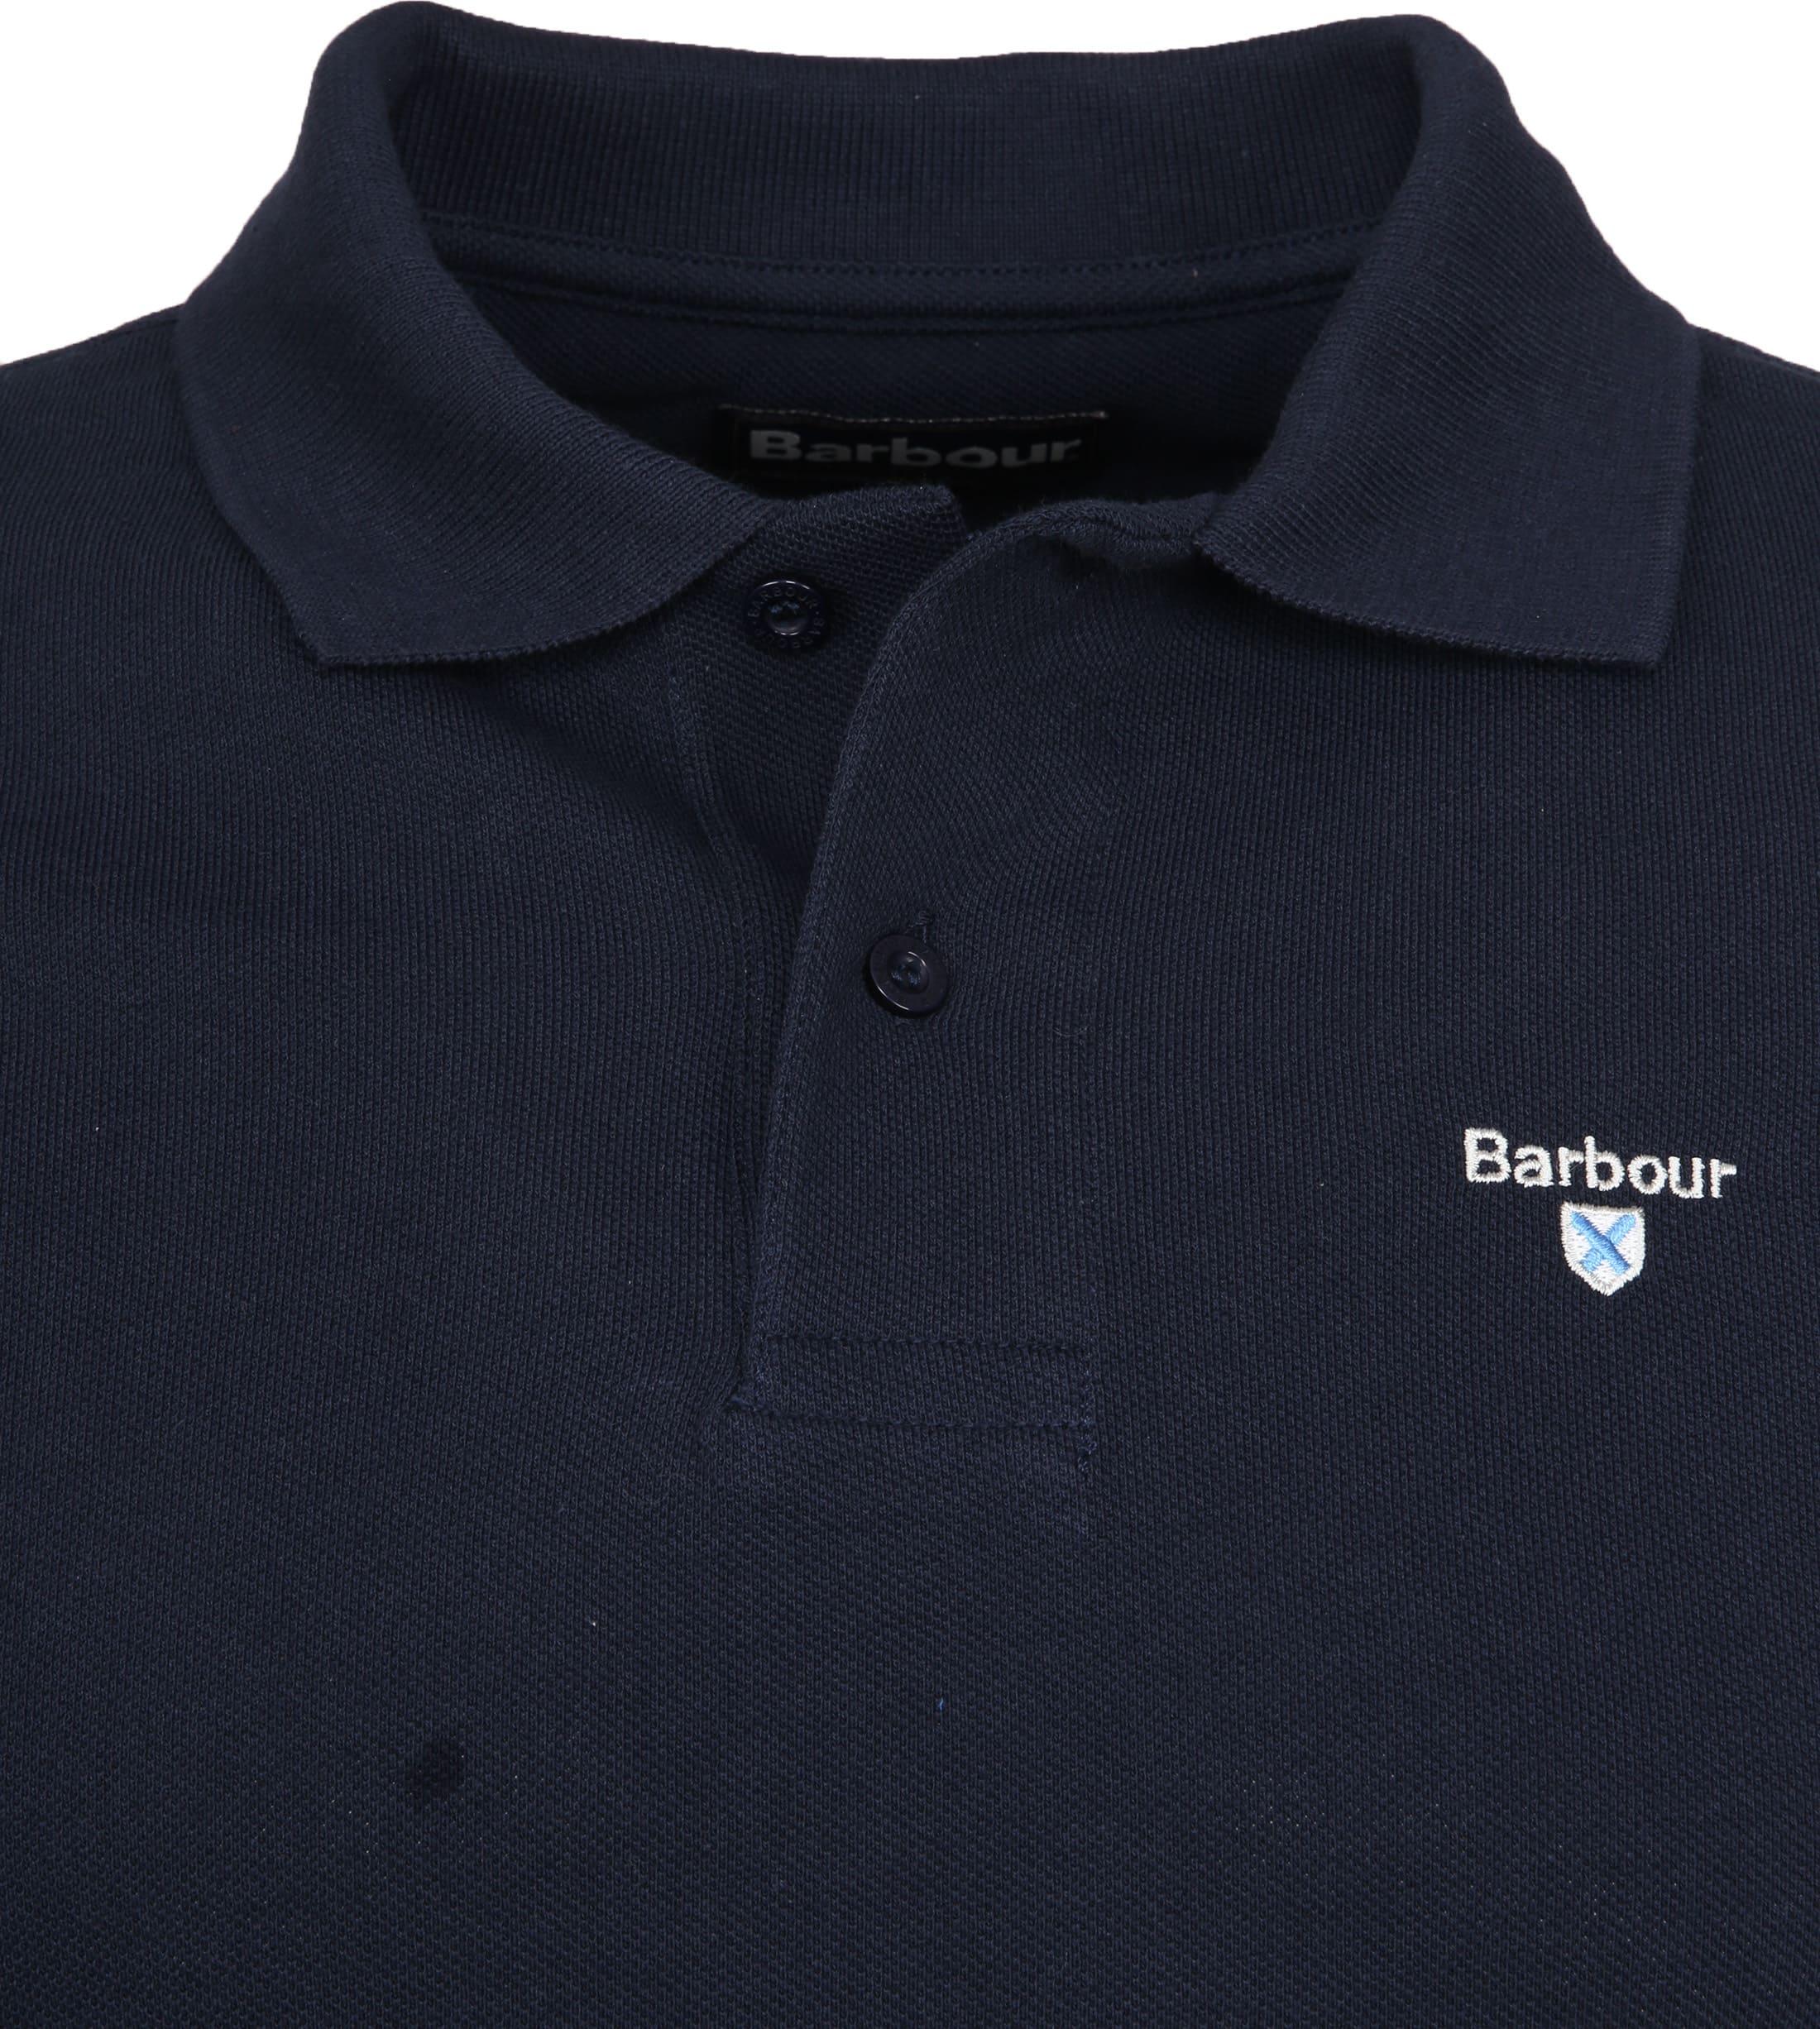 Barbour Basic Poloshirt Navy foto 1